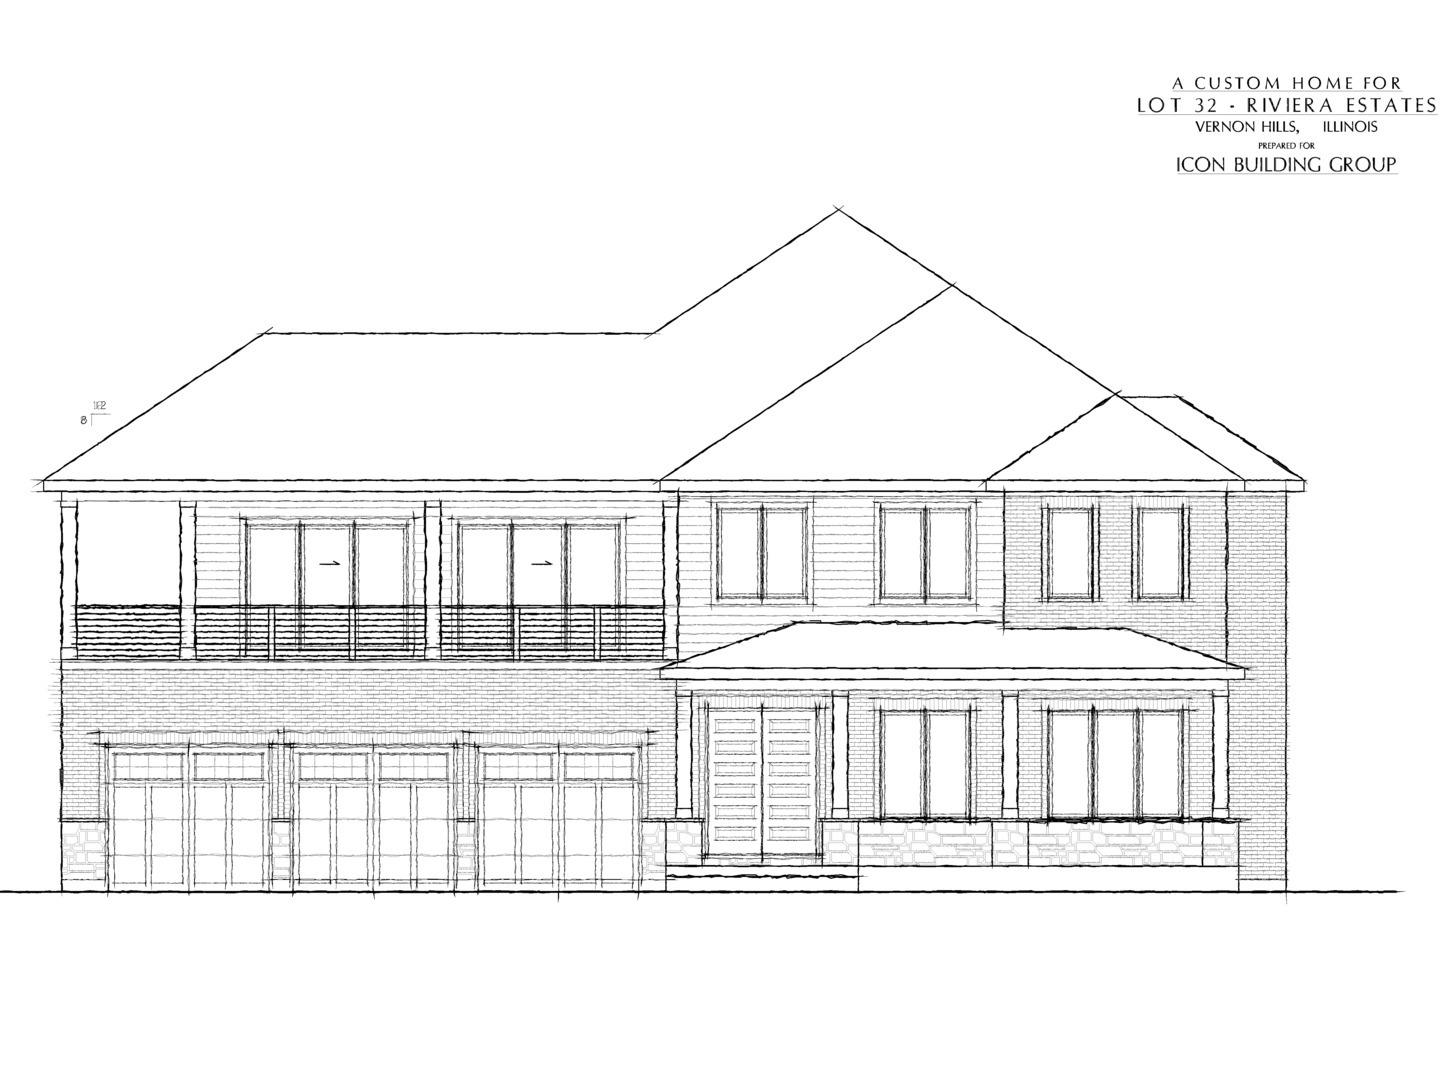 1604 N Lake Charles Drive, Vernon Hills, Il 60061